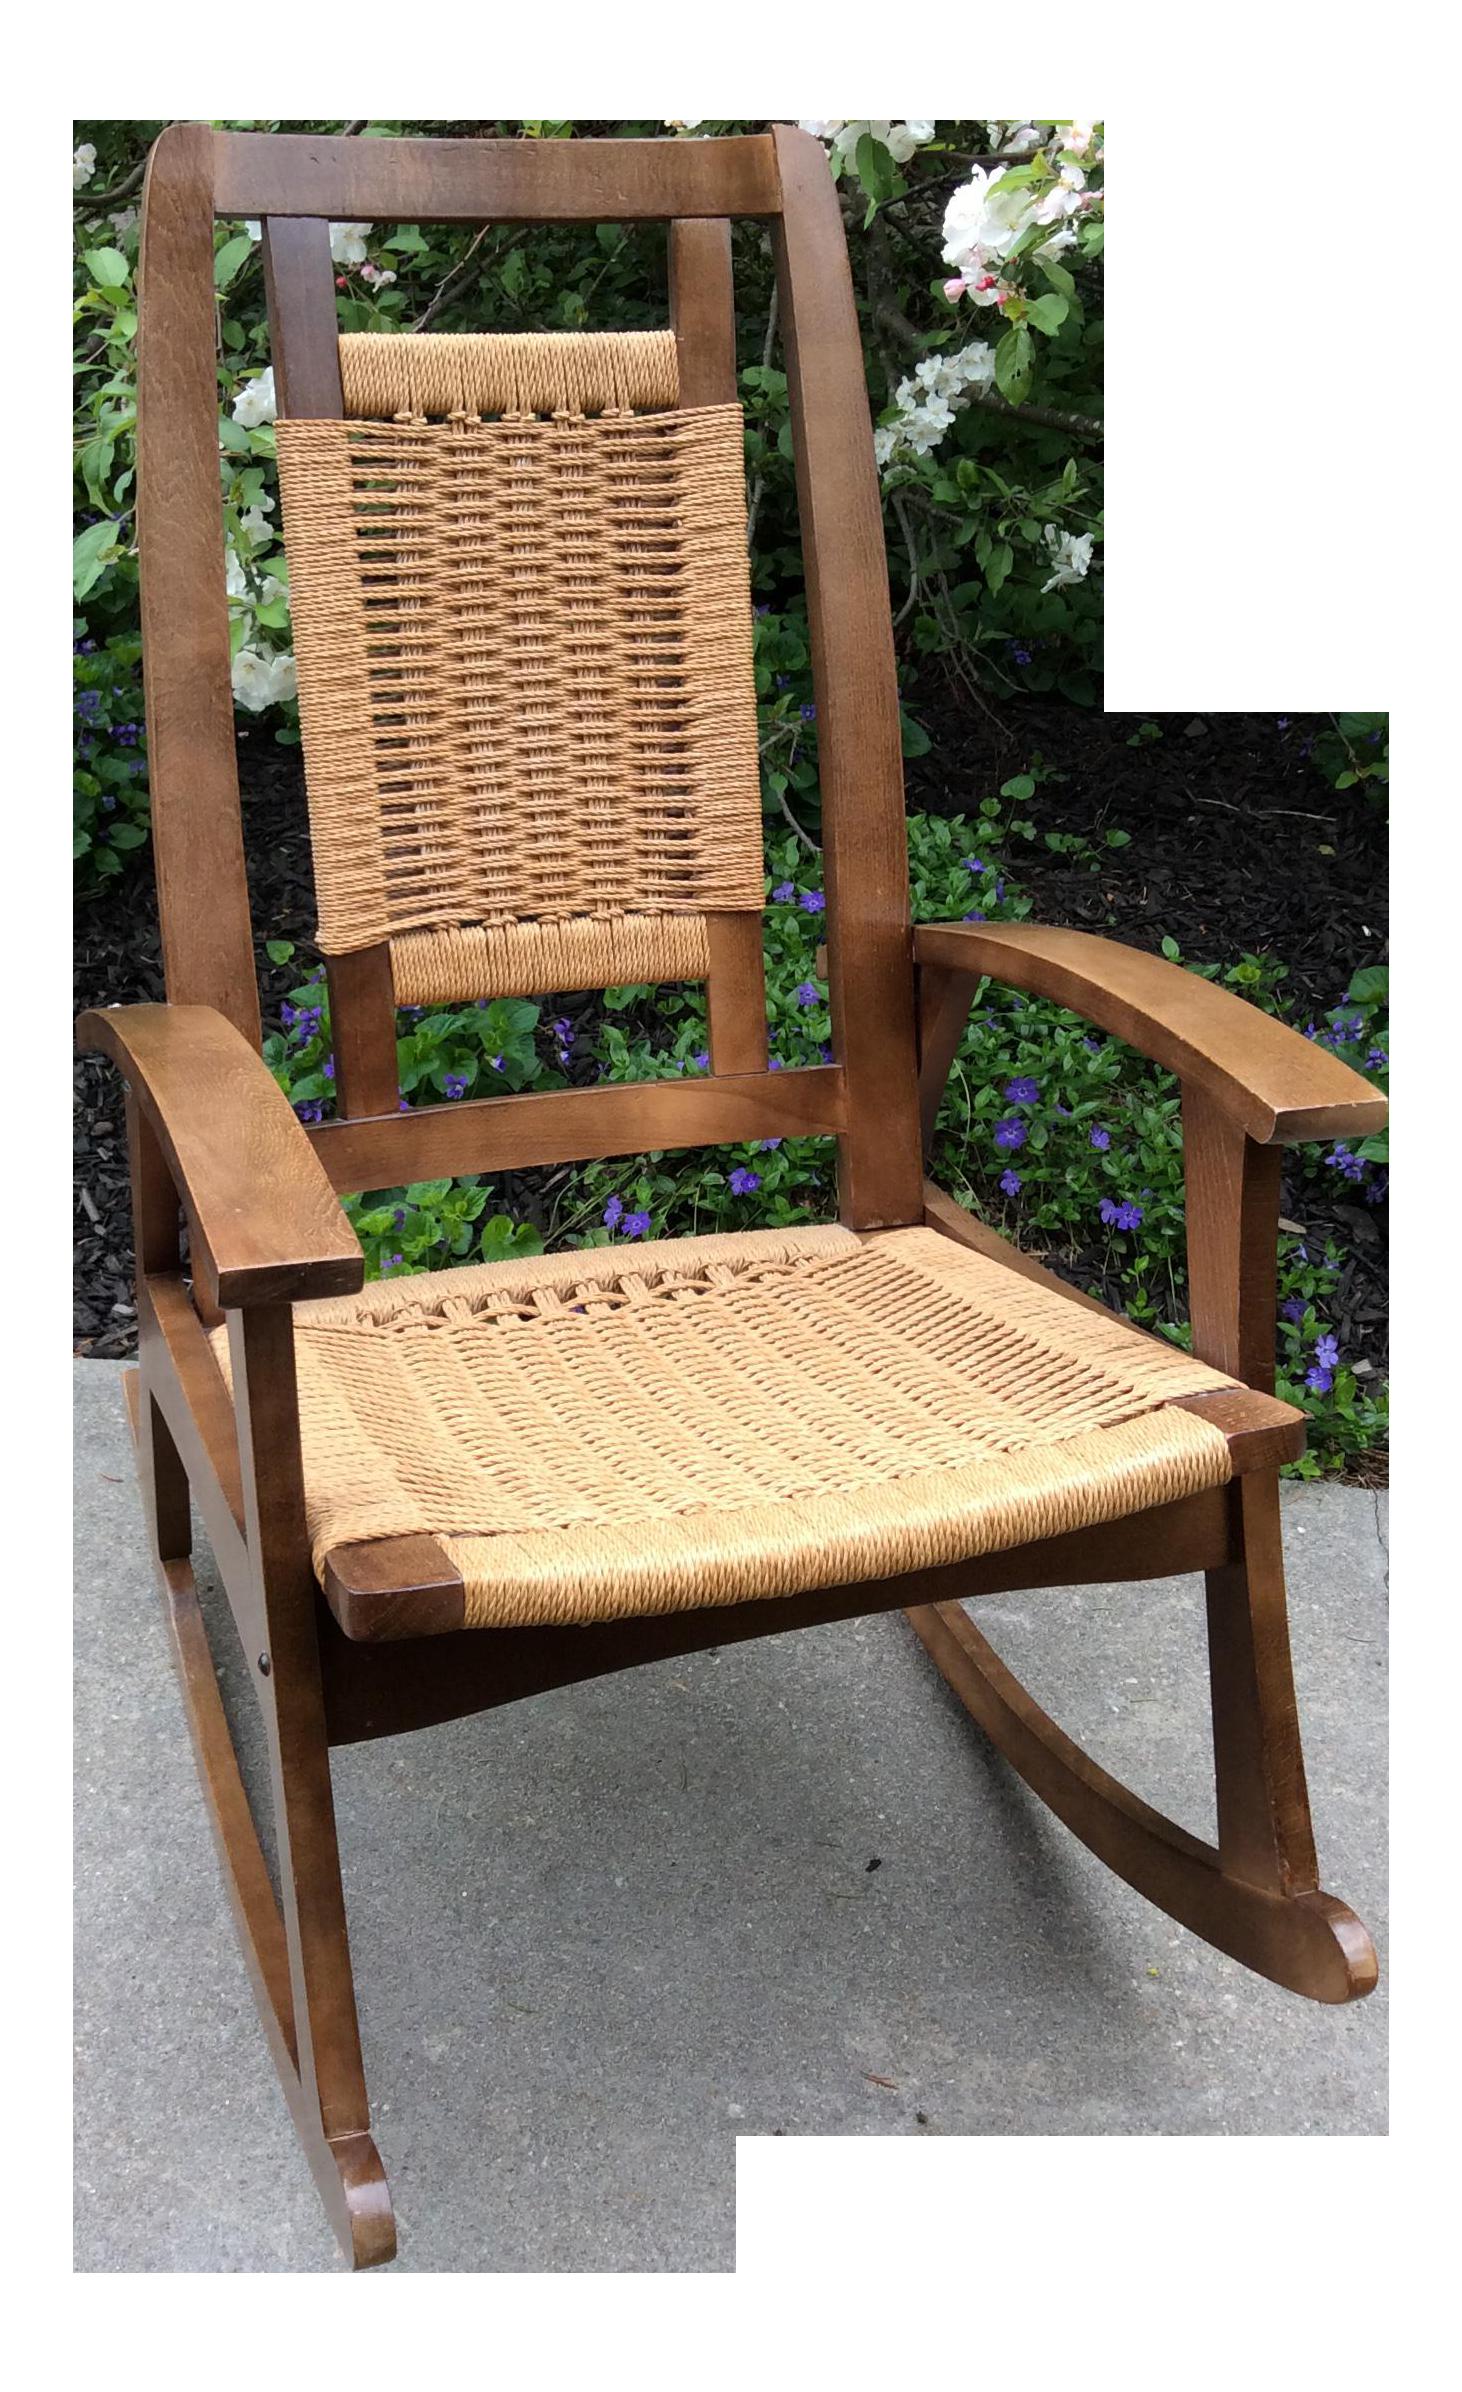 Hans Wegner Style Mid Century Modern Woven Rope Rocking Chair